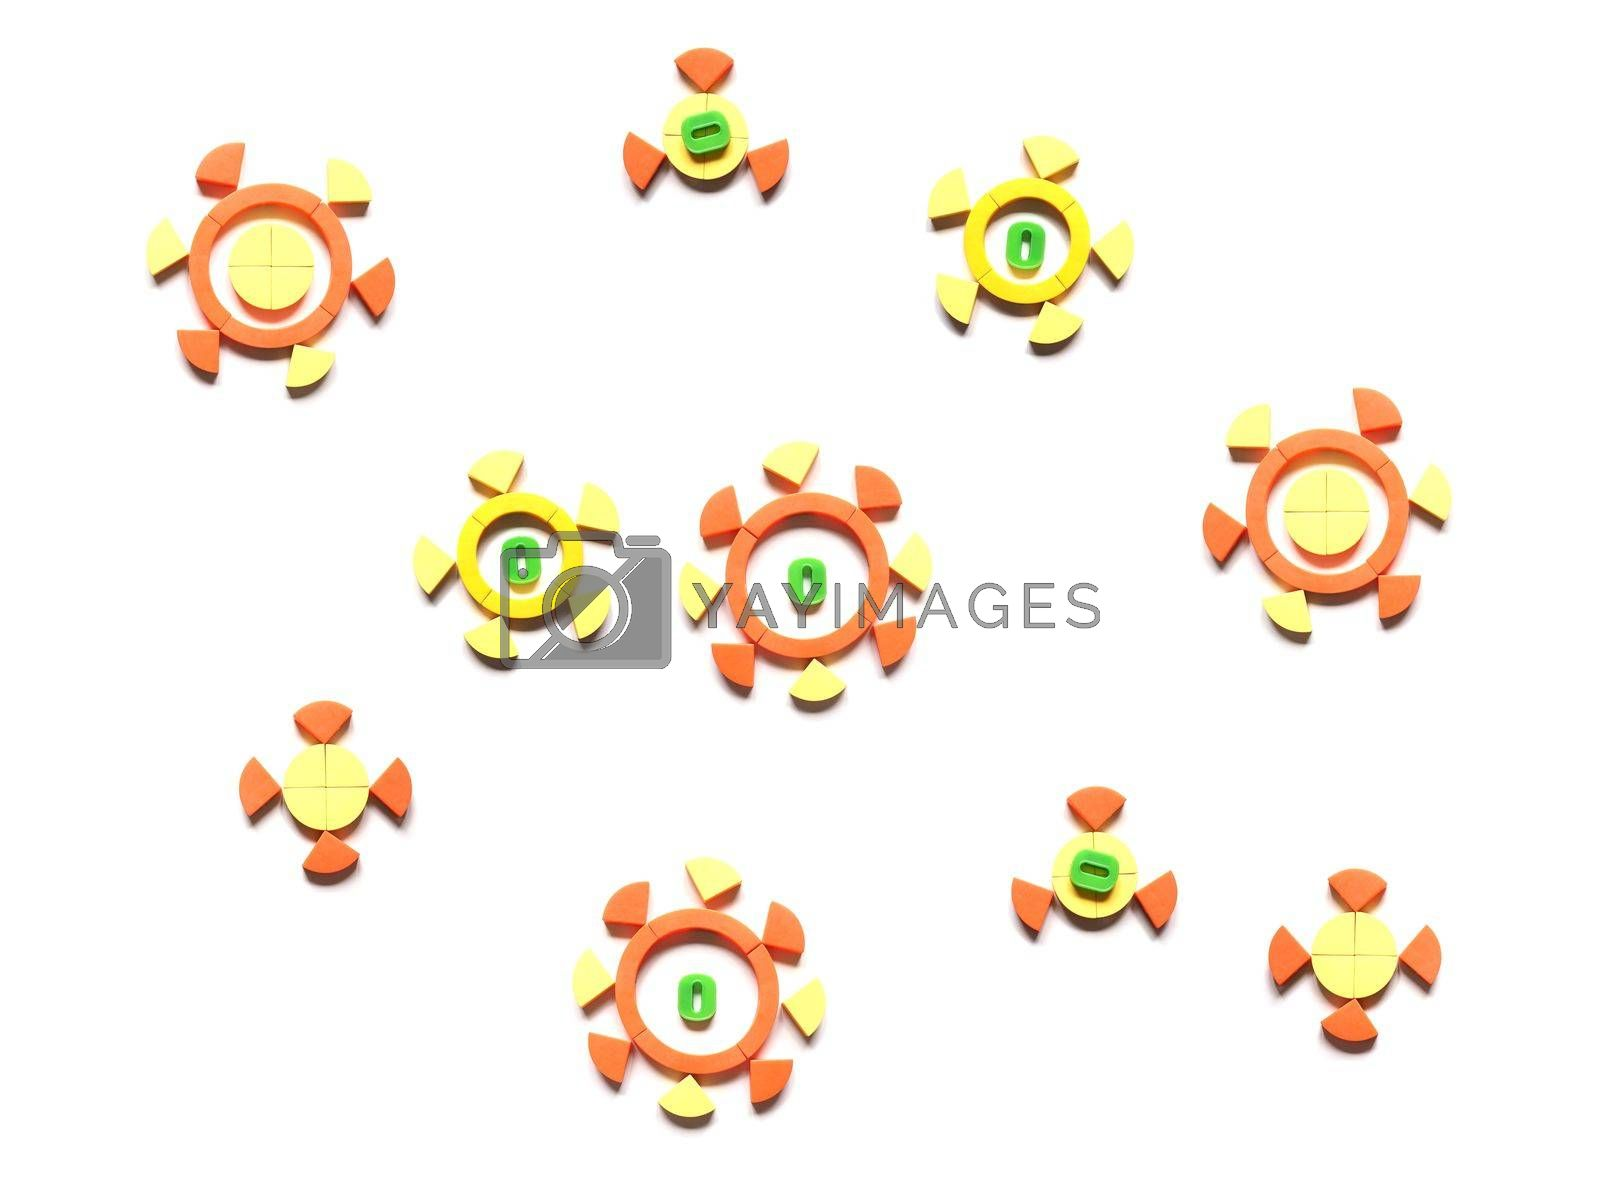 artist impression of a covid-19 aka coronavirus virus